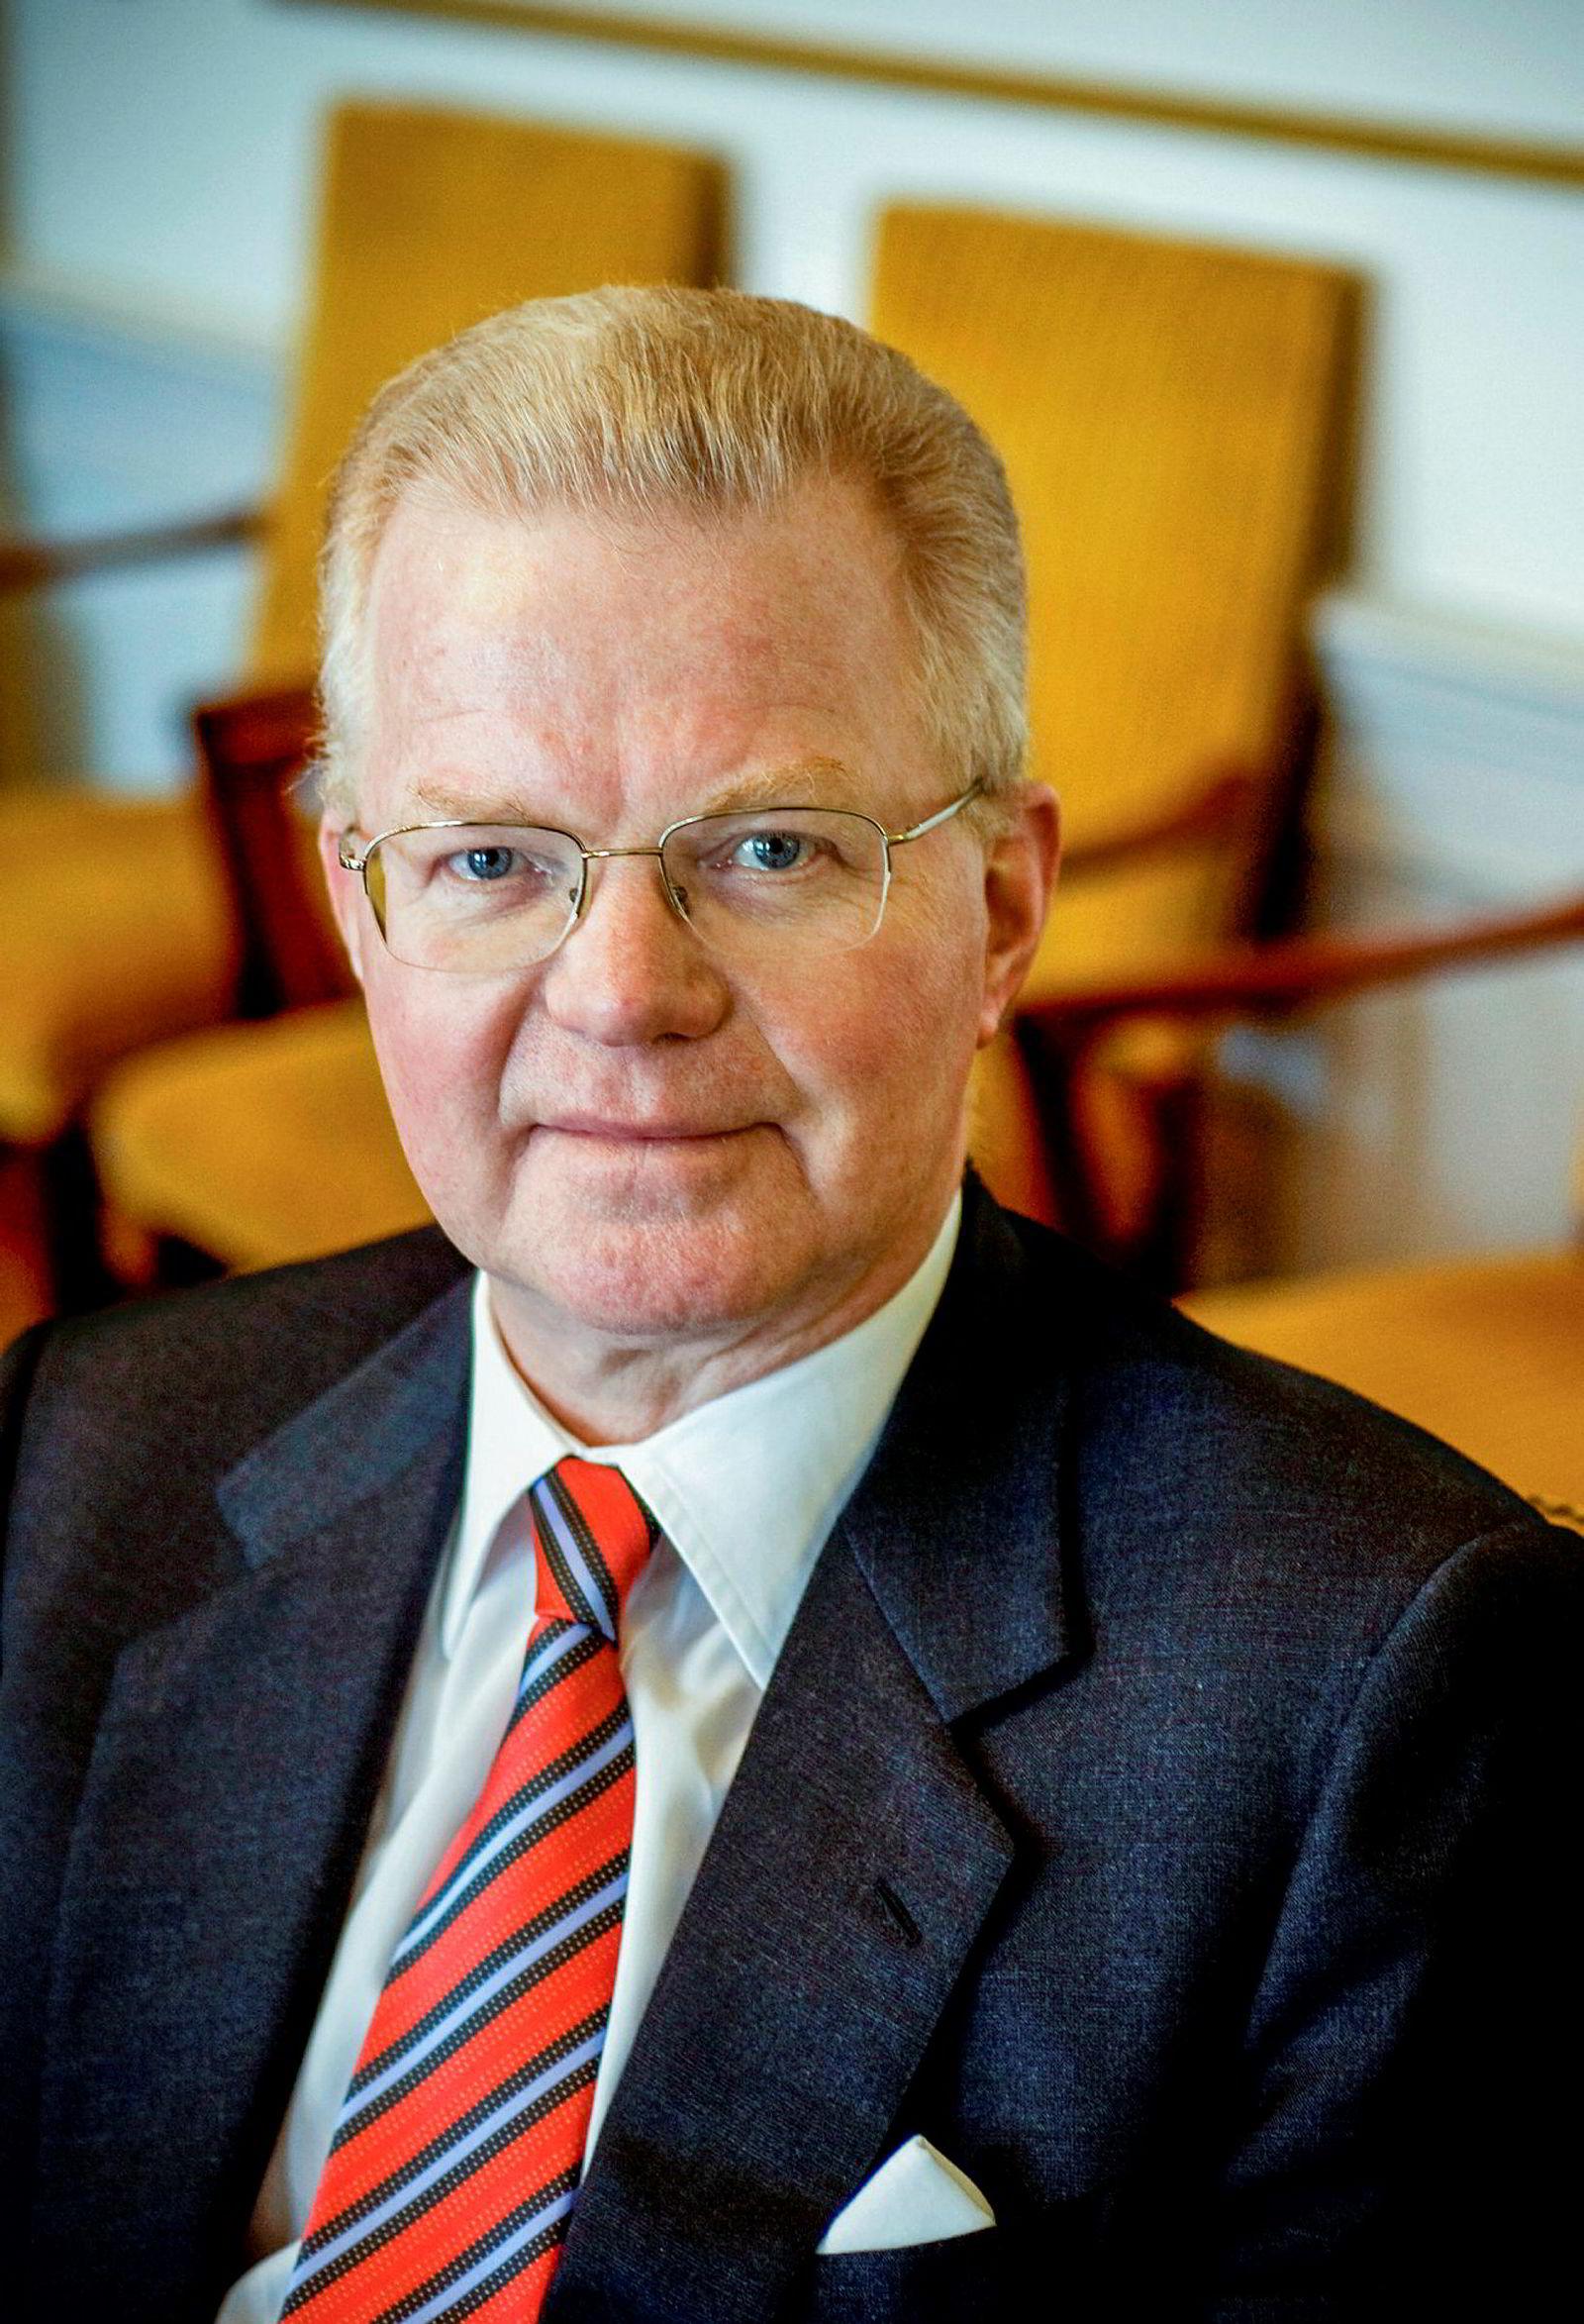 Forretningsmannen Fredrik Lundberg står oppført med en formue på 36 milliarder kroner, ifølge Forbes.